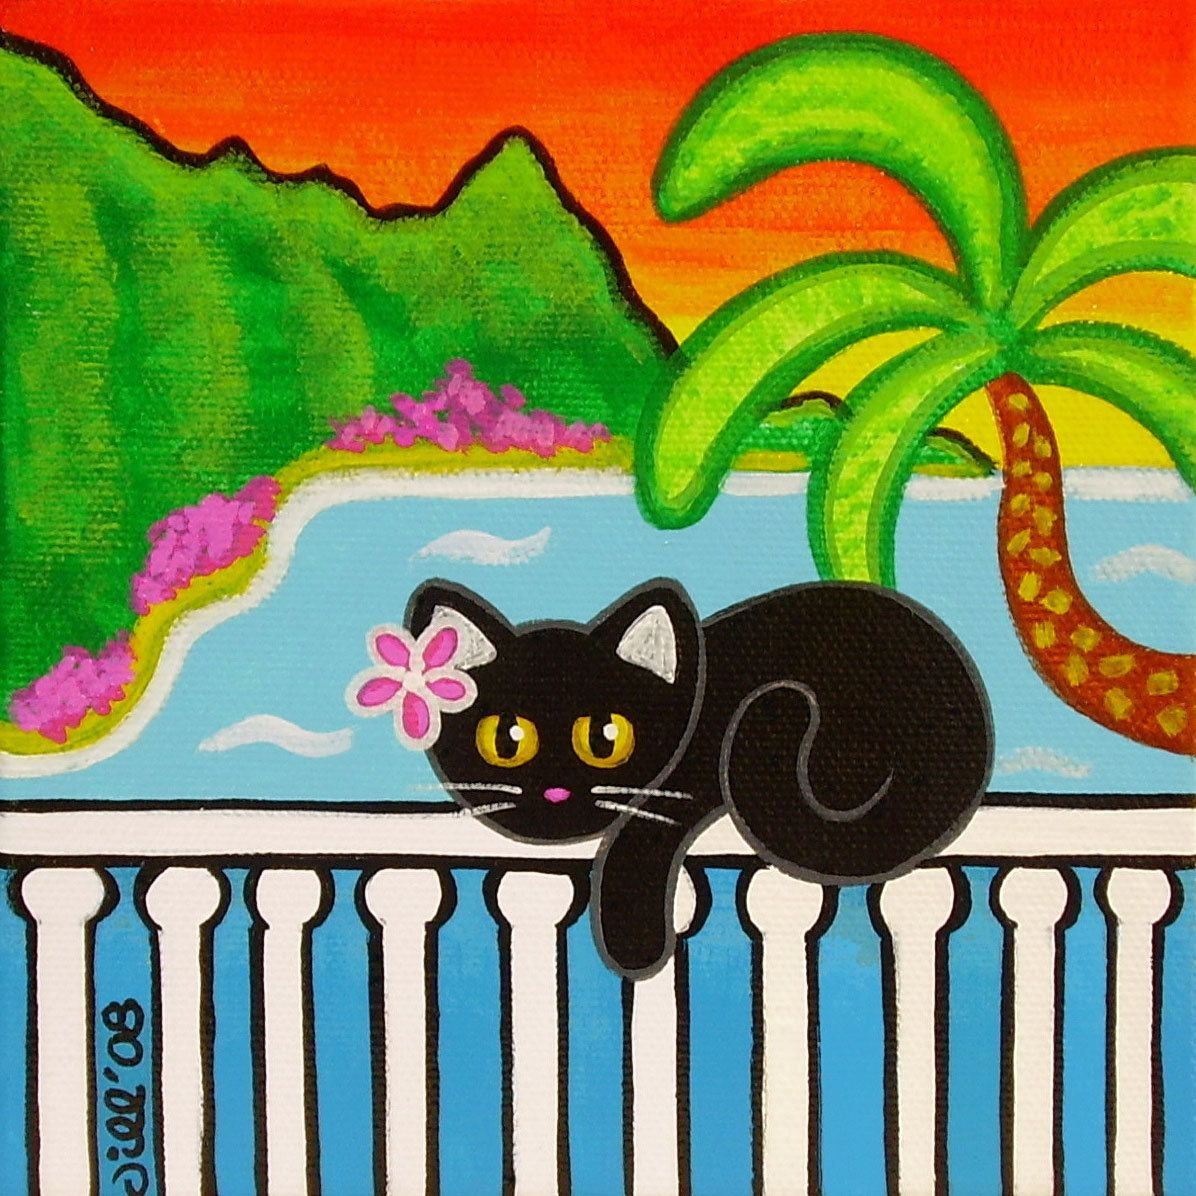 Hanalei Bay-Kauai | Original prints | Pinterest | Hanalei bay and ...